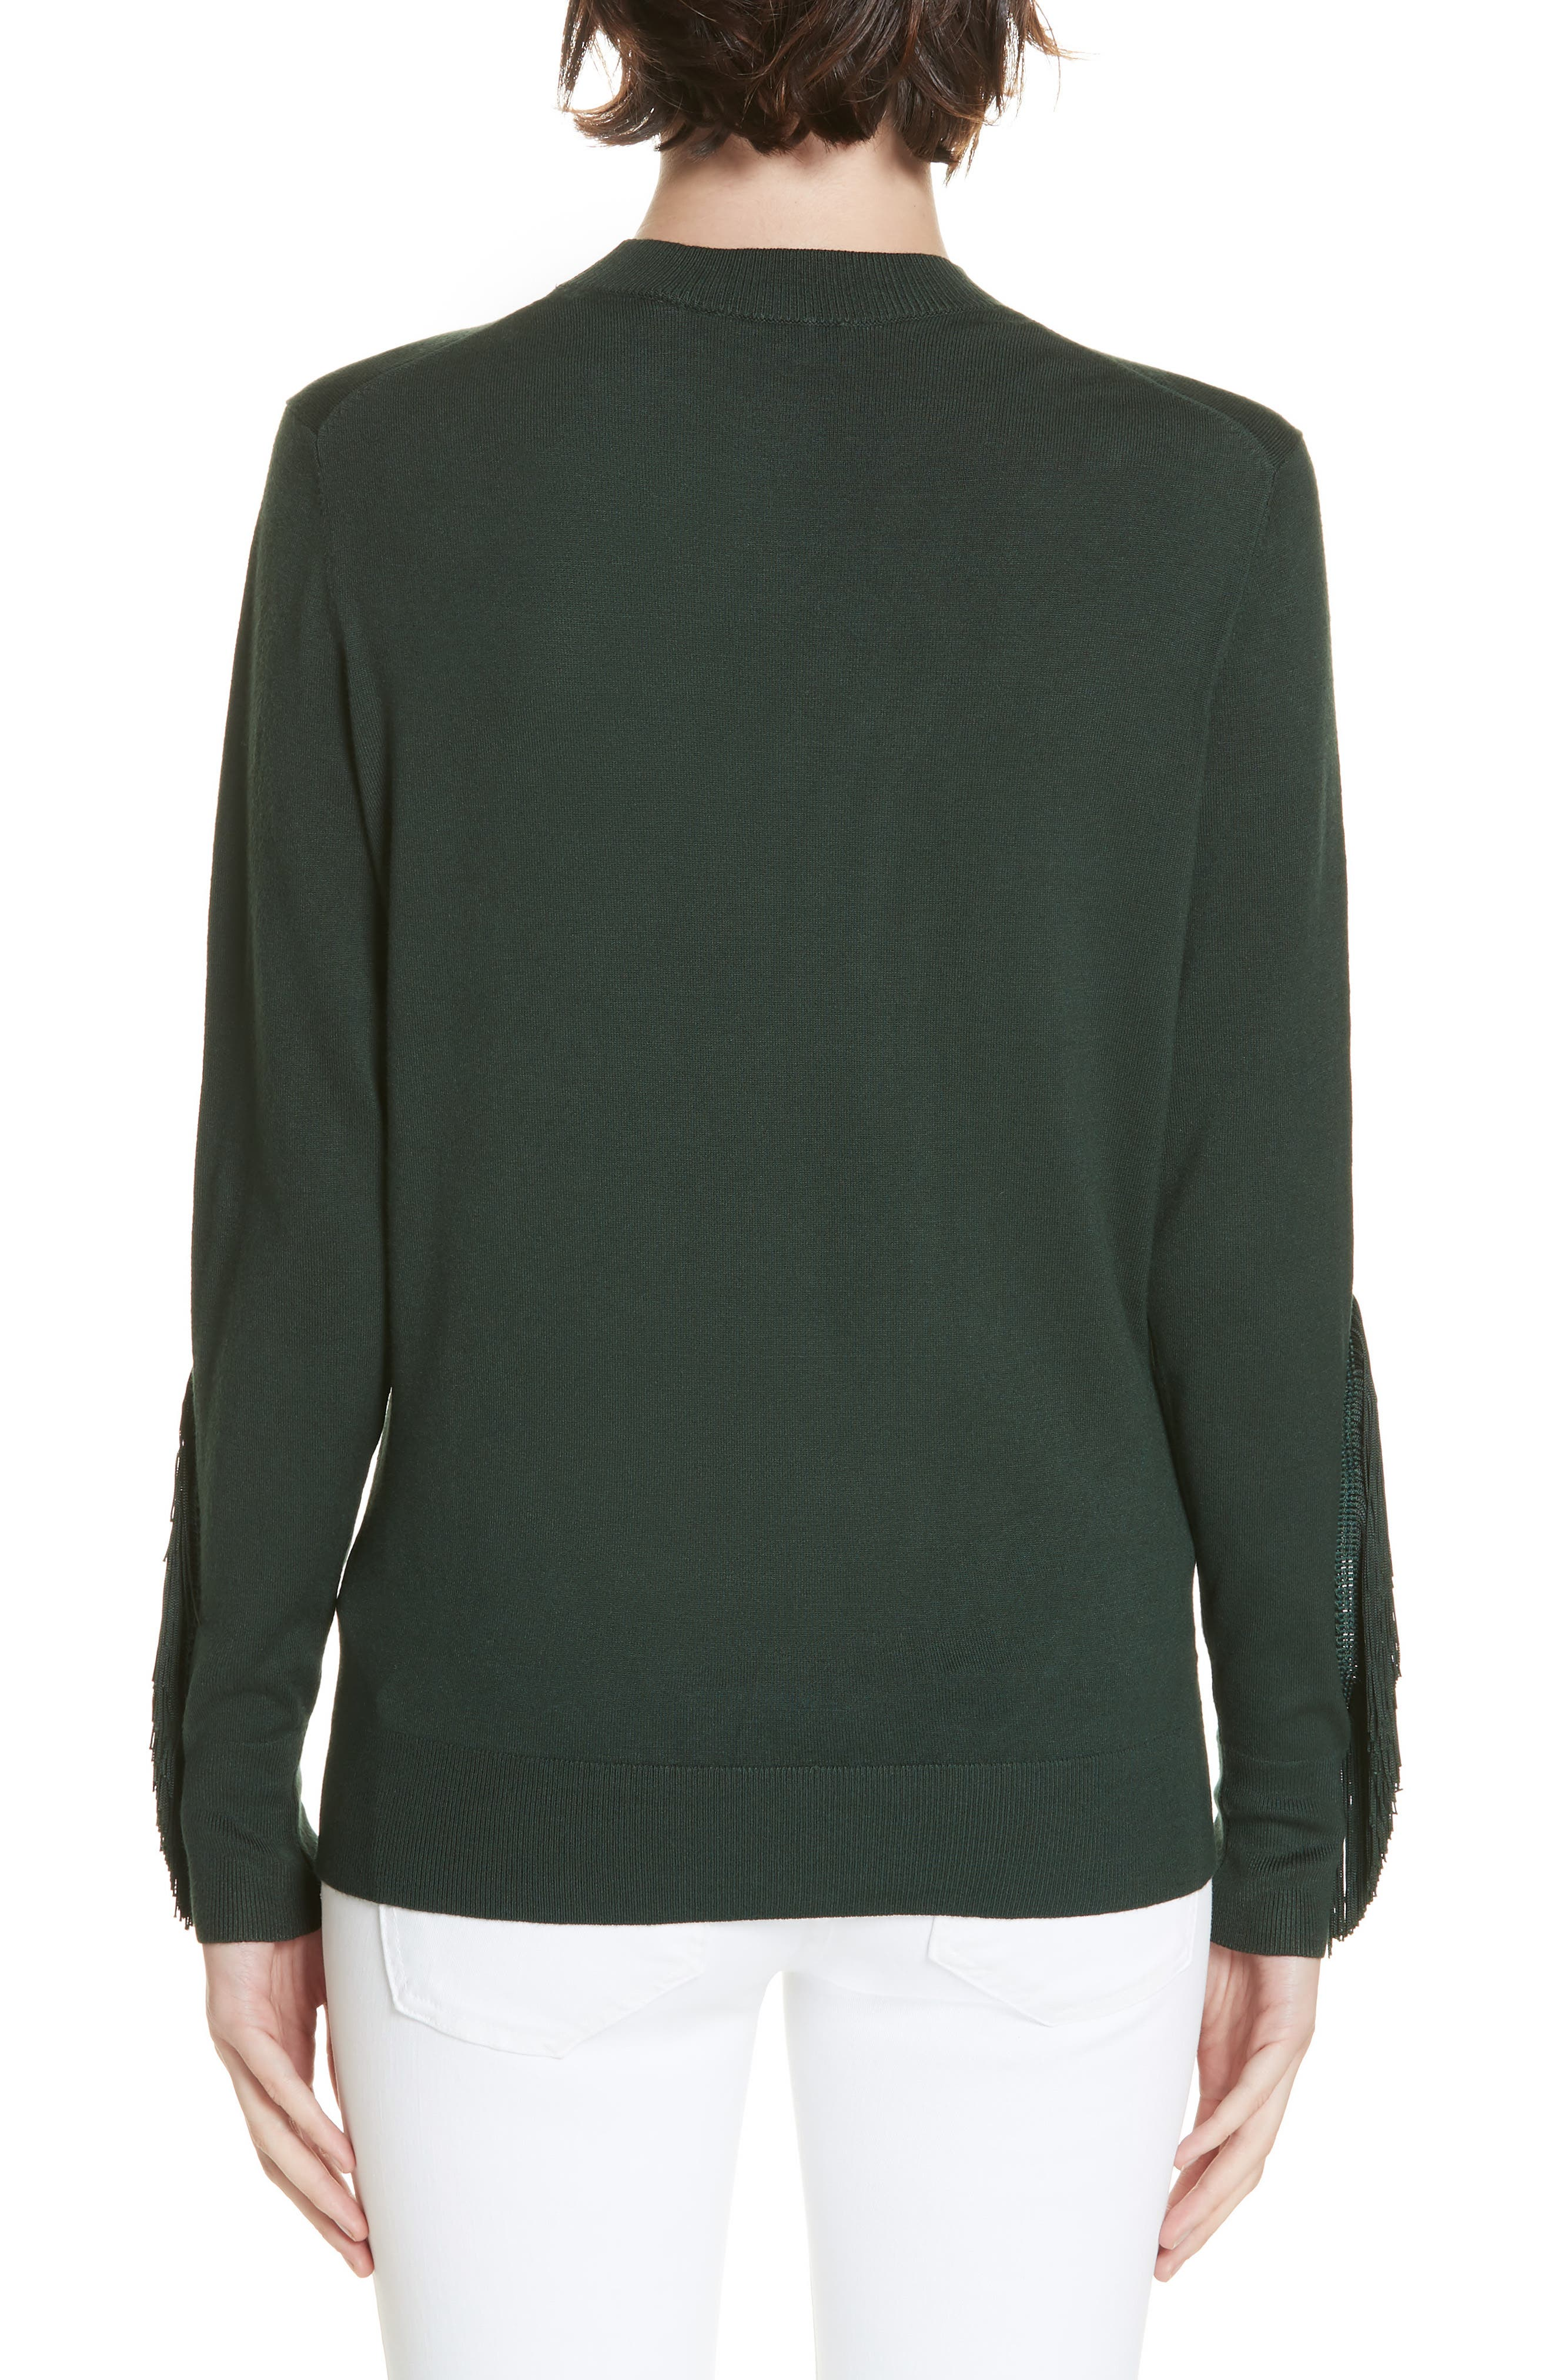 Aniebal Fringe Trim Sweater,                             Alternate thumbnail 2, color,                             DARK GREEN